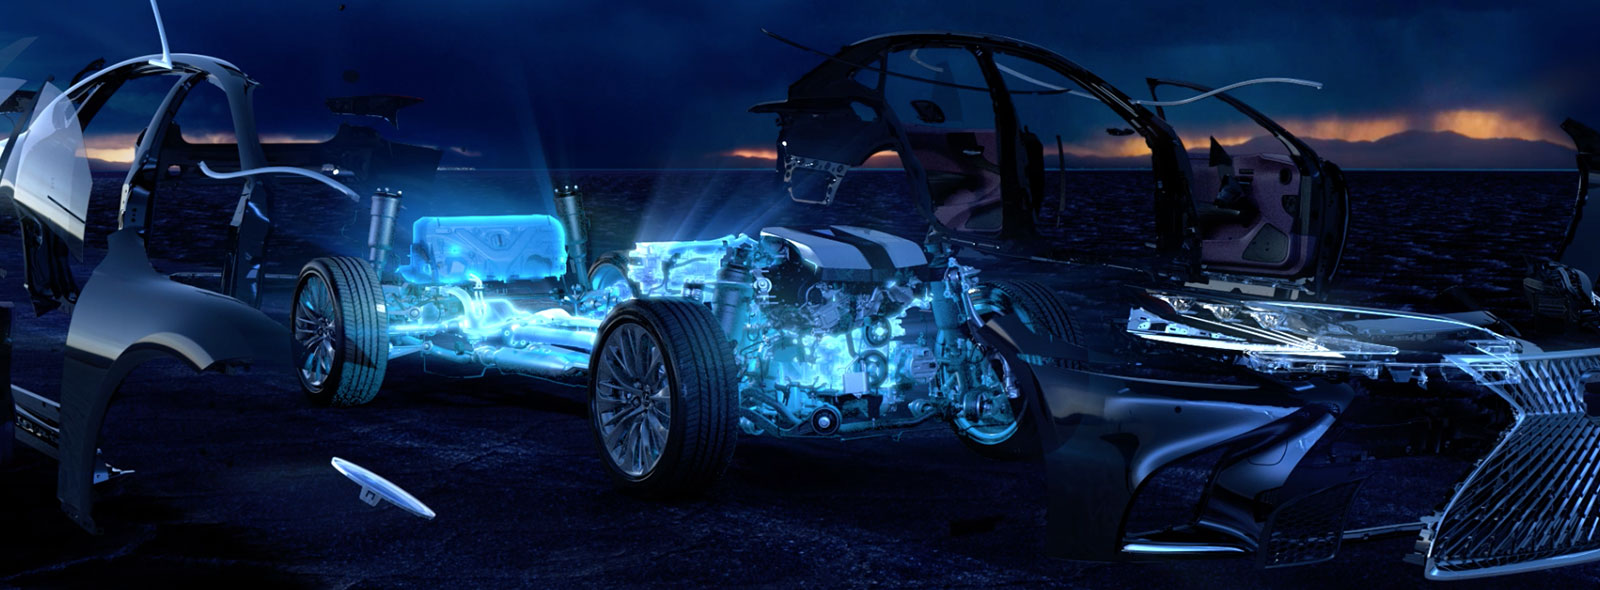 Videobild Lexus LS 500h hybridteknik